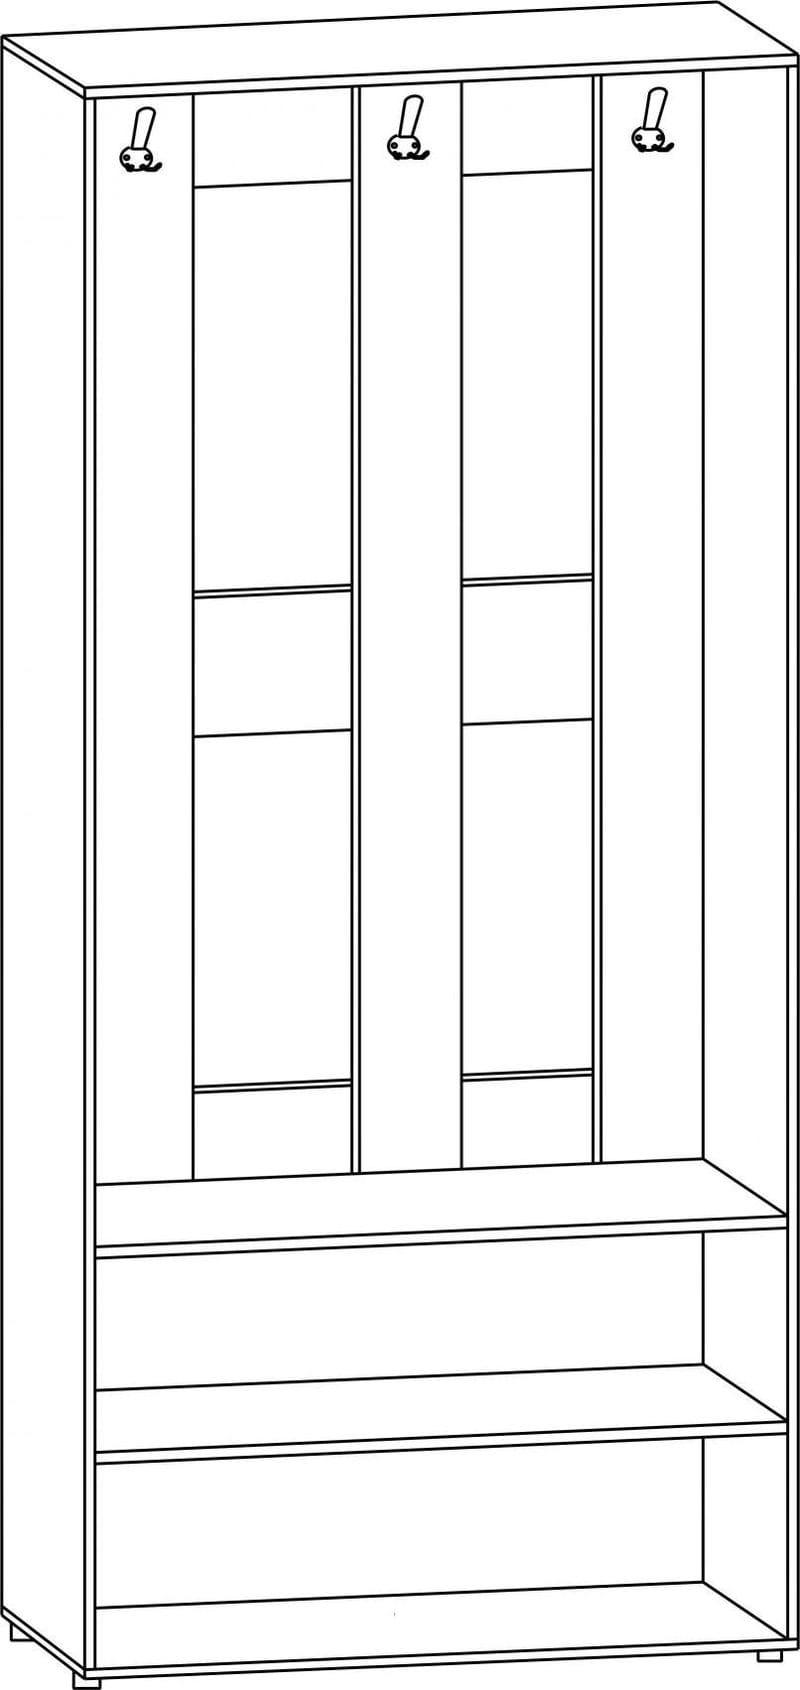 "Шкаф вешалка открытый с дверцами В-62Л, ""Вече лайт"""